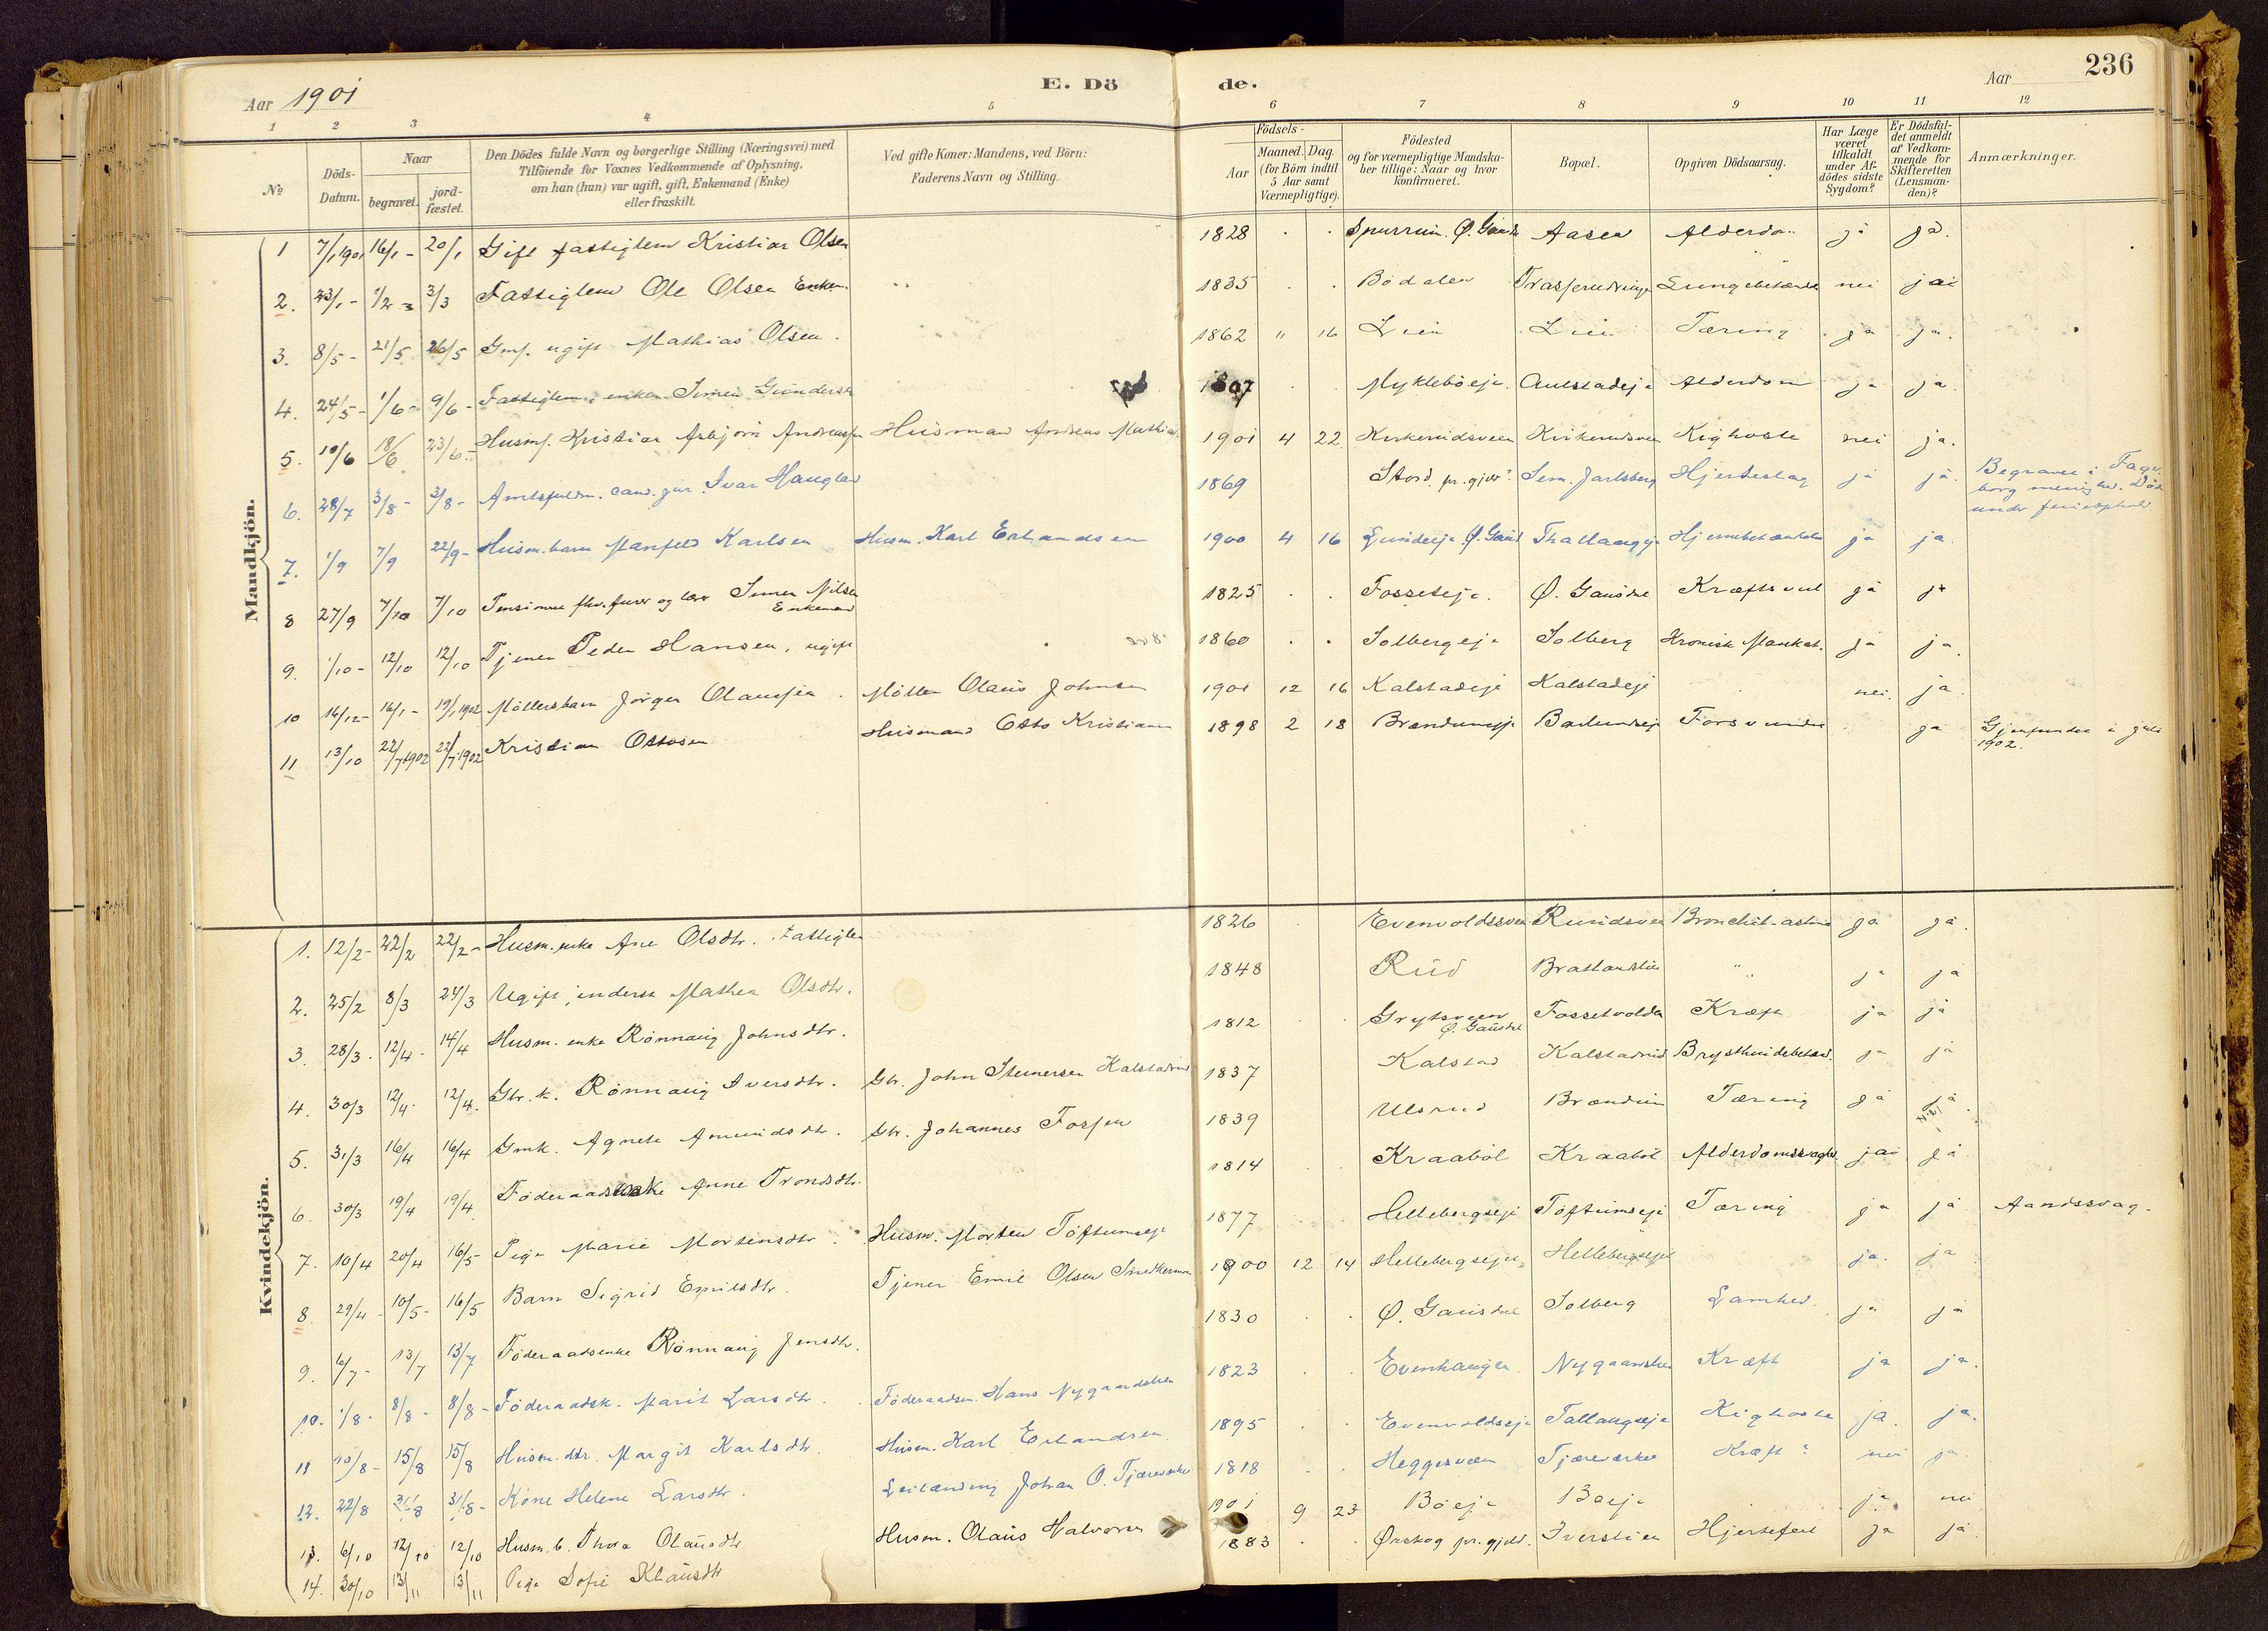 SAH, Vestre Gausdal prestekontor, Ministerialbok nr. 1, 1887-1914, s. 236